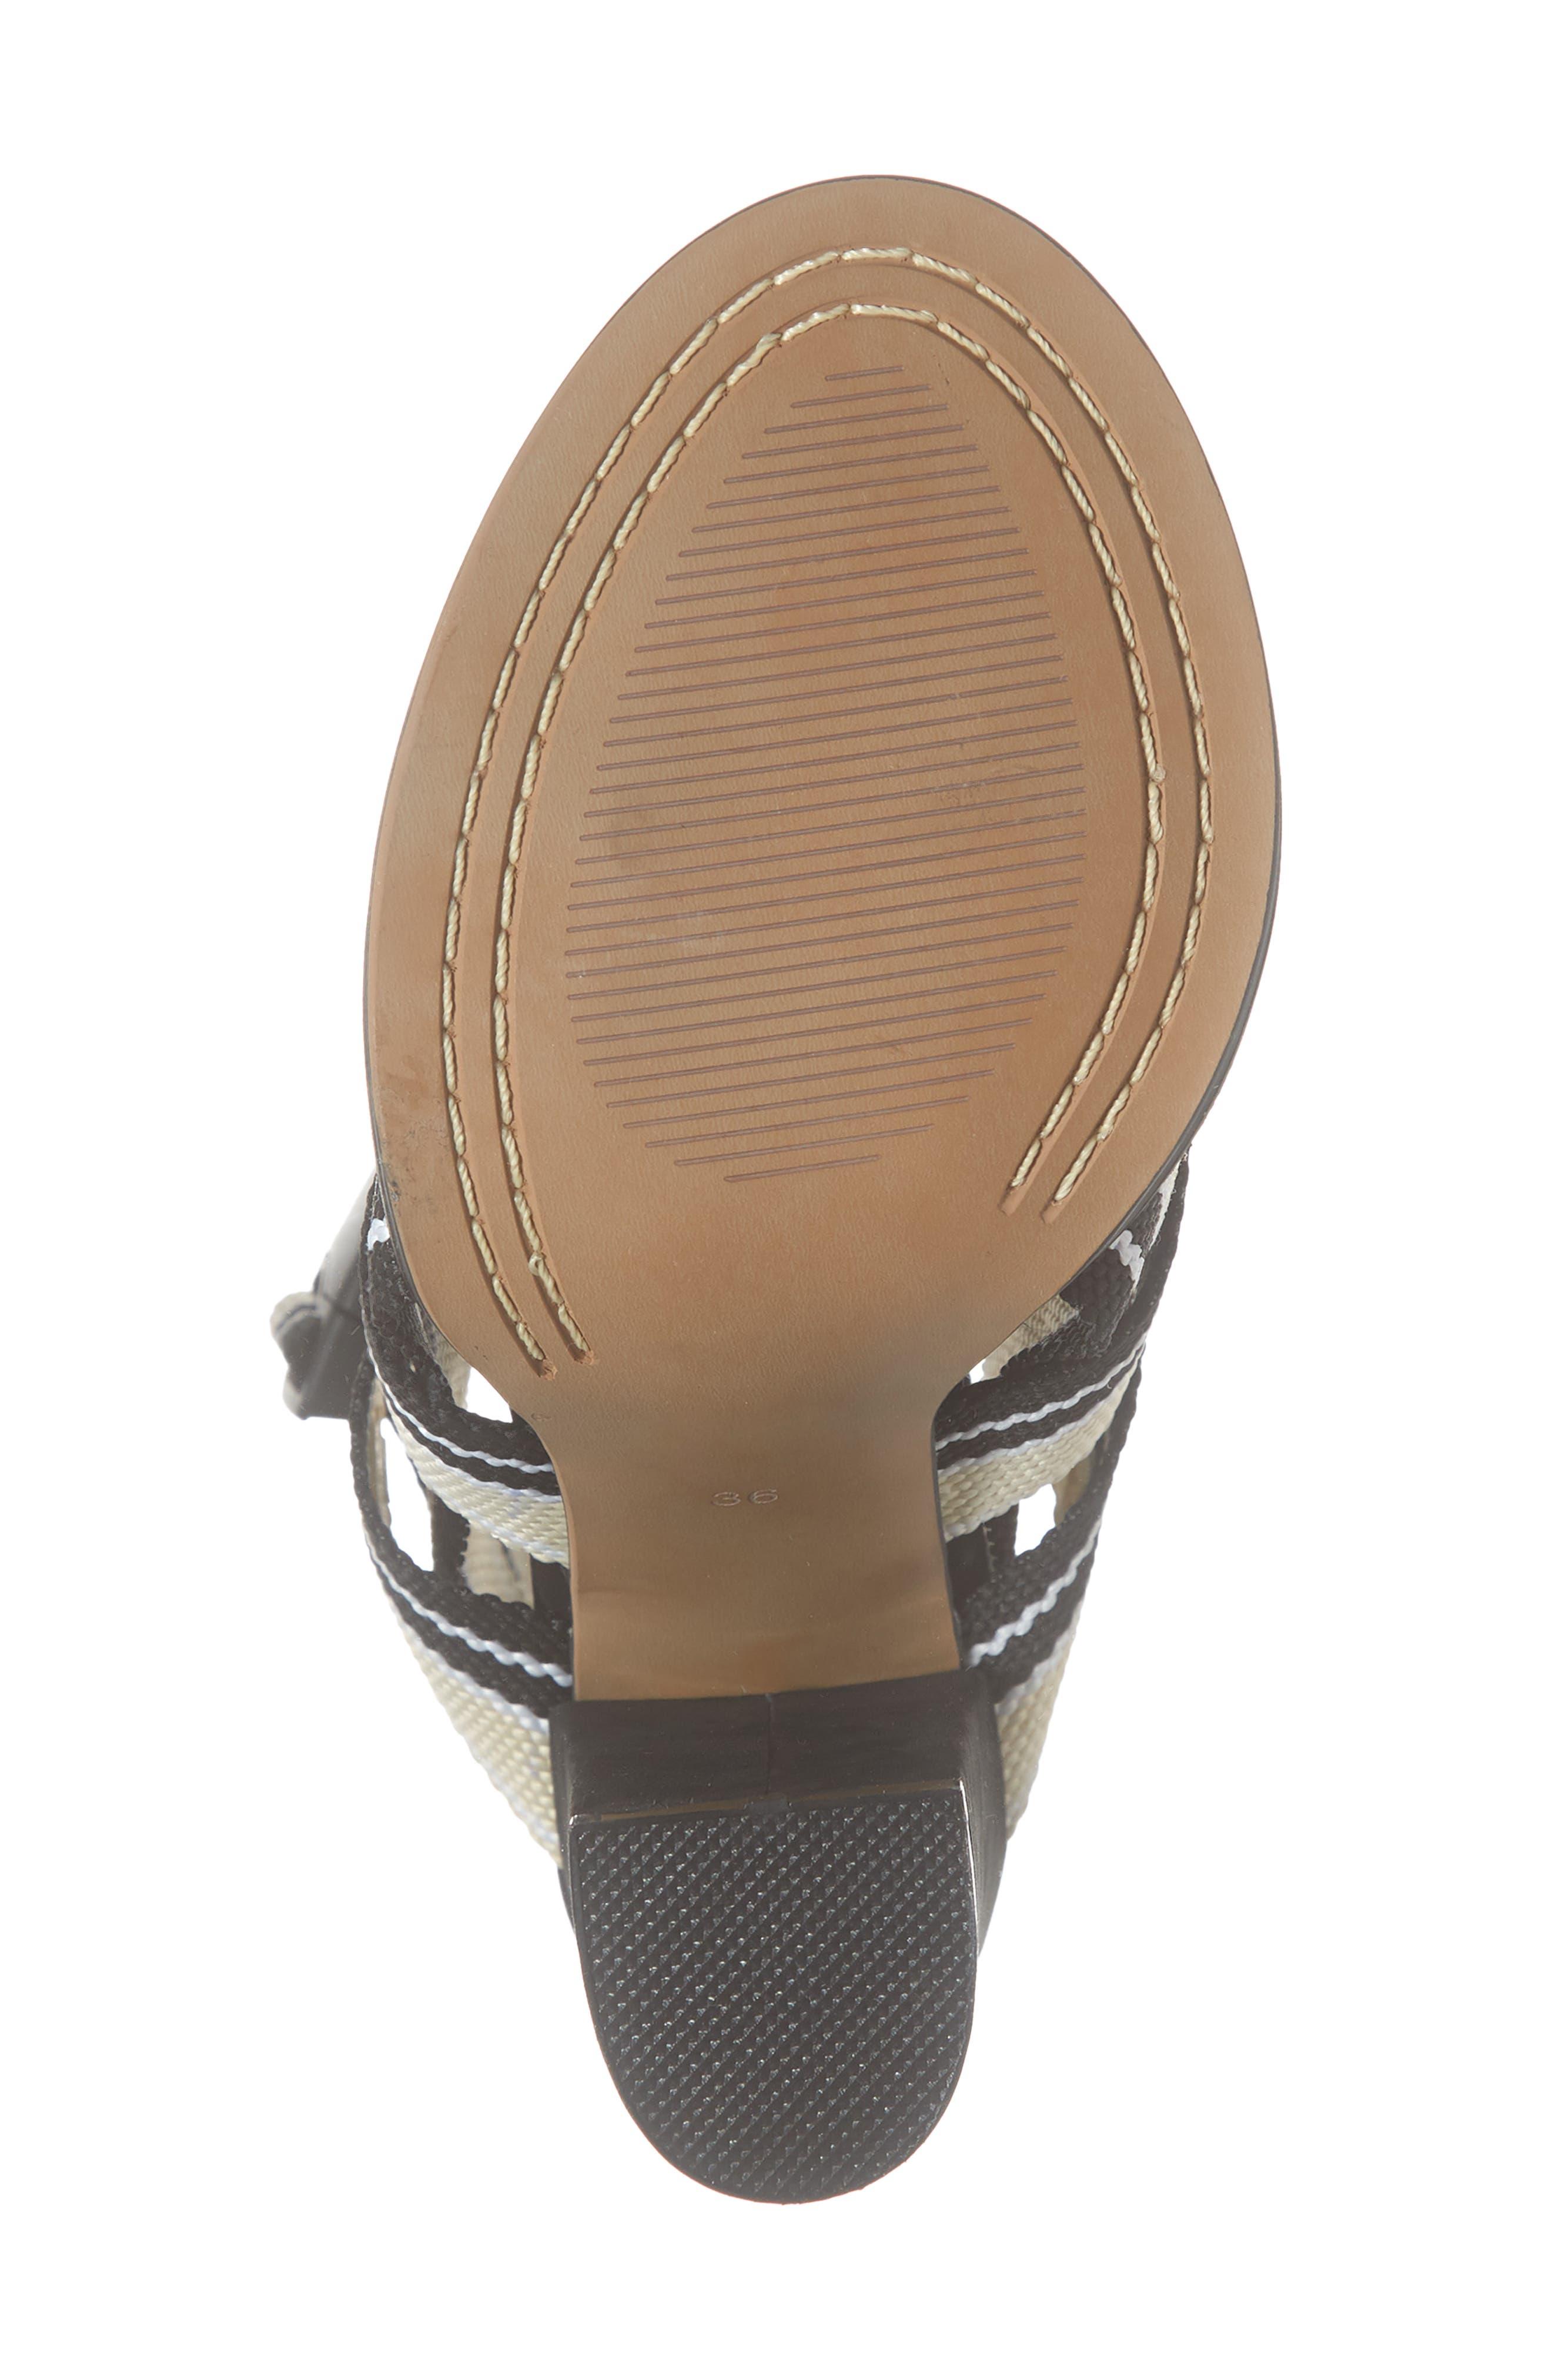 ALIAS MAE, Woven Strappy Sandal, Alternate thumbnail 6, color, NUDE/ BLACK FABRIC